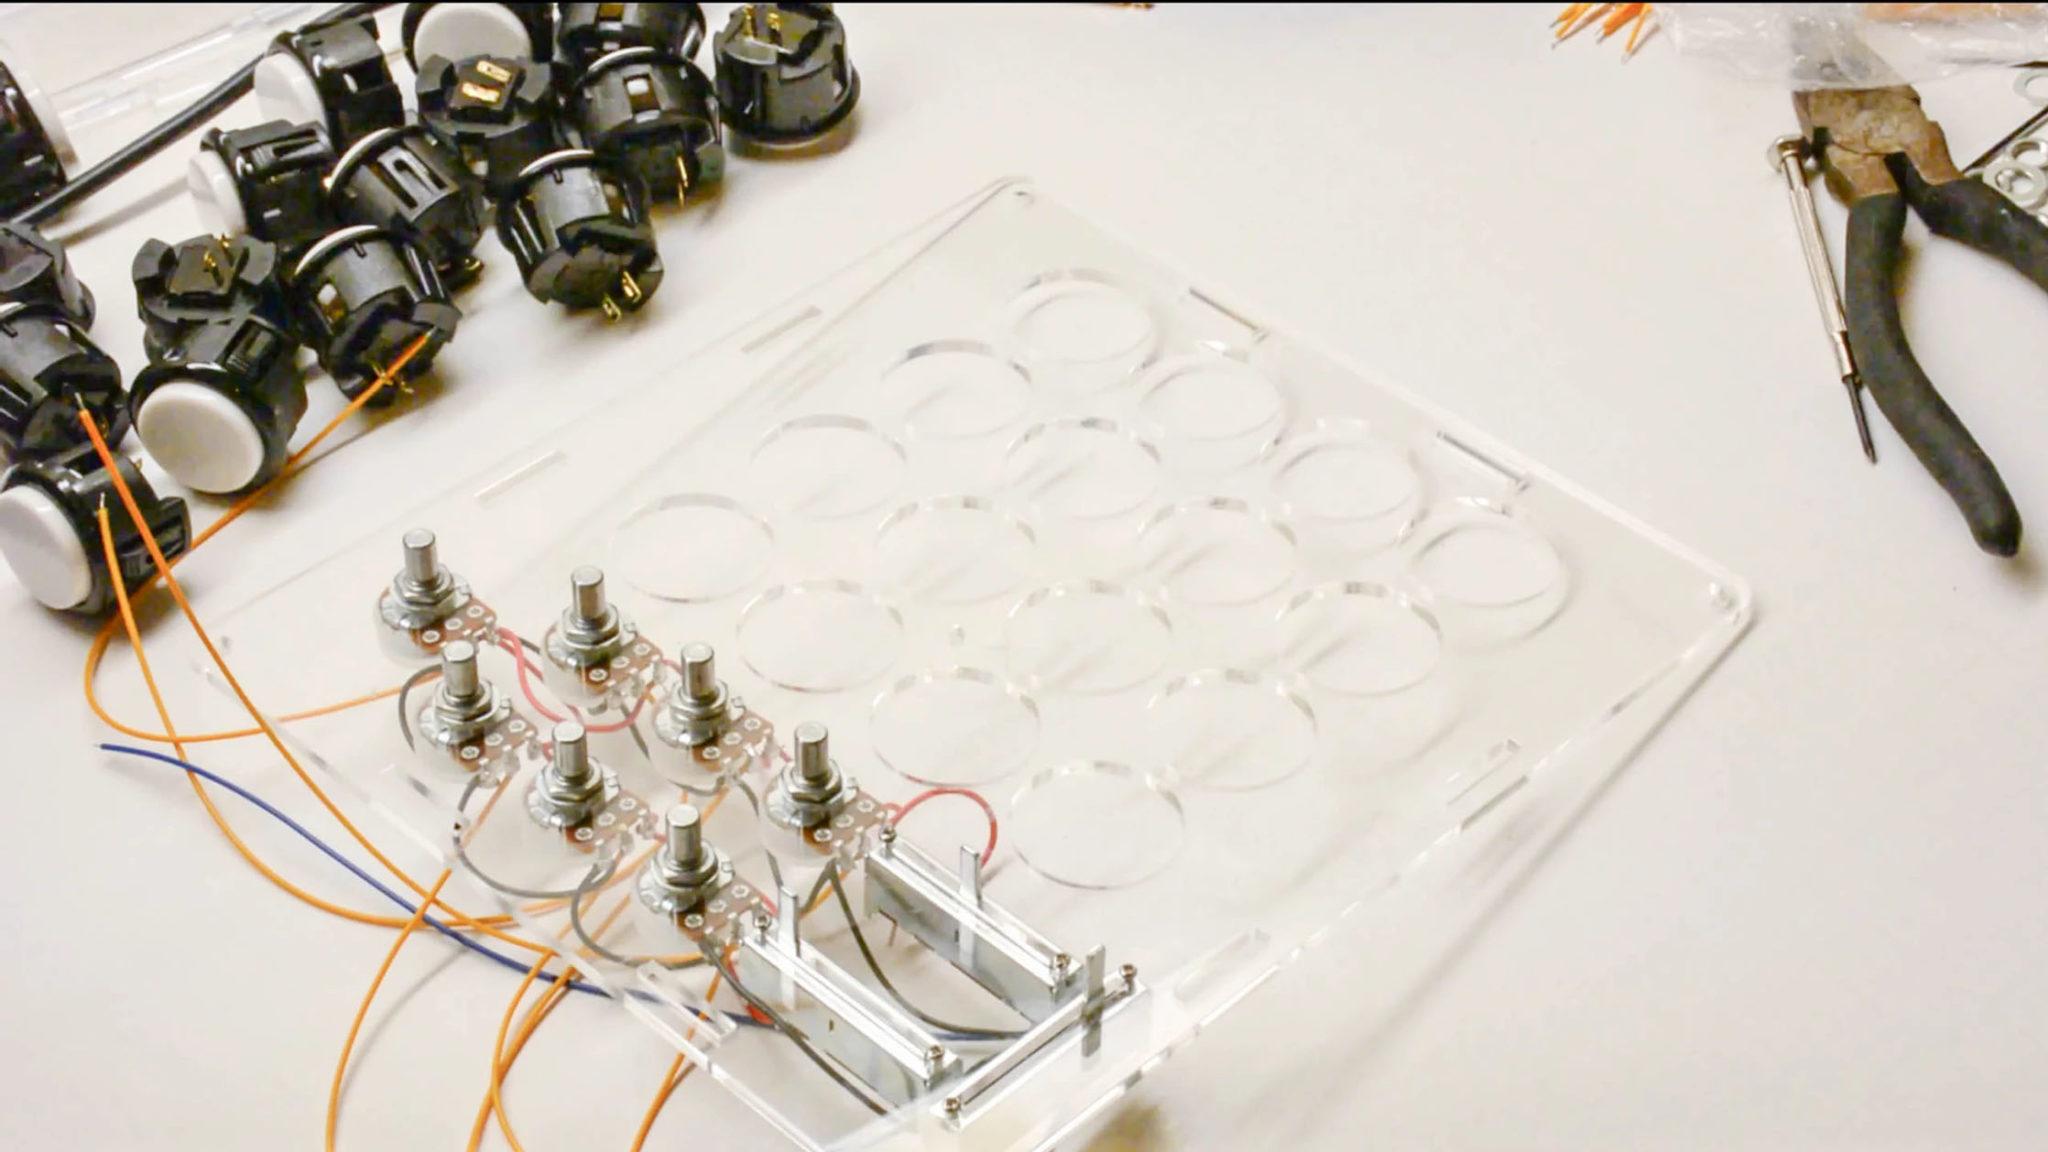 02-slider-potentiometers